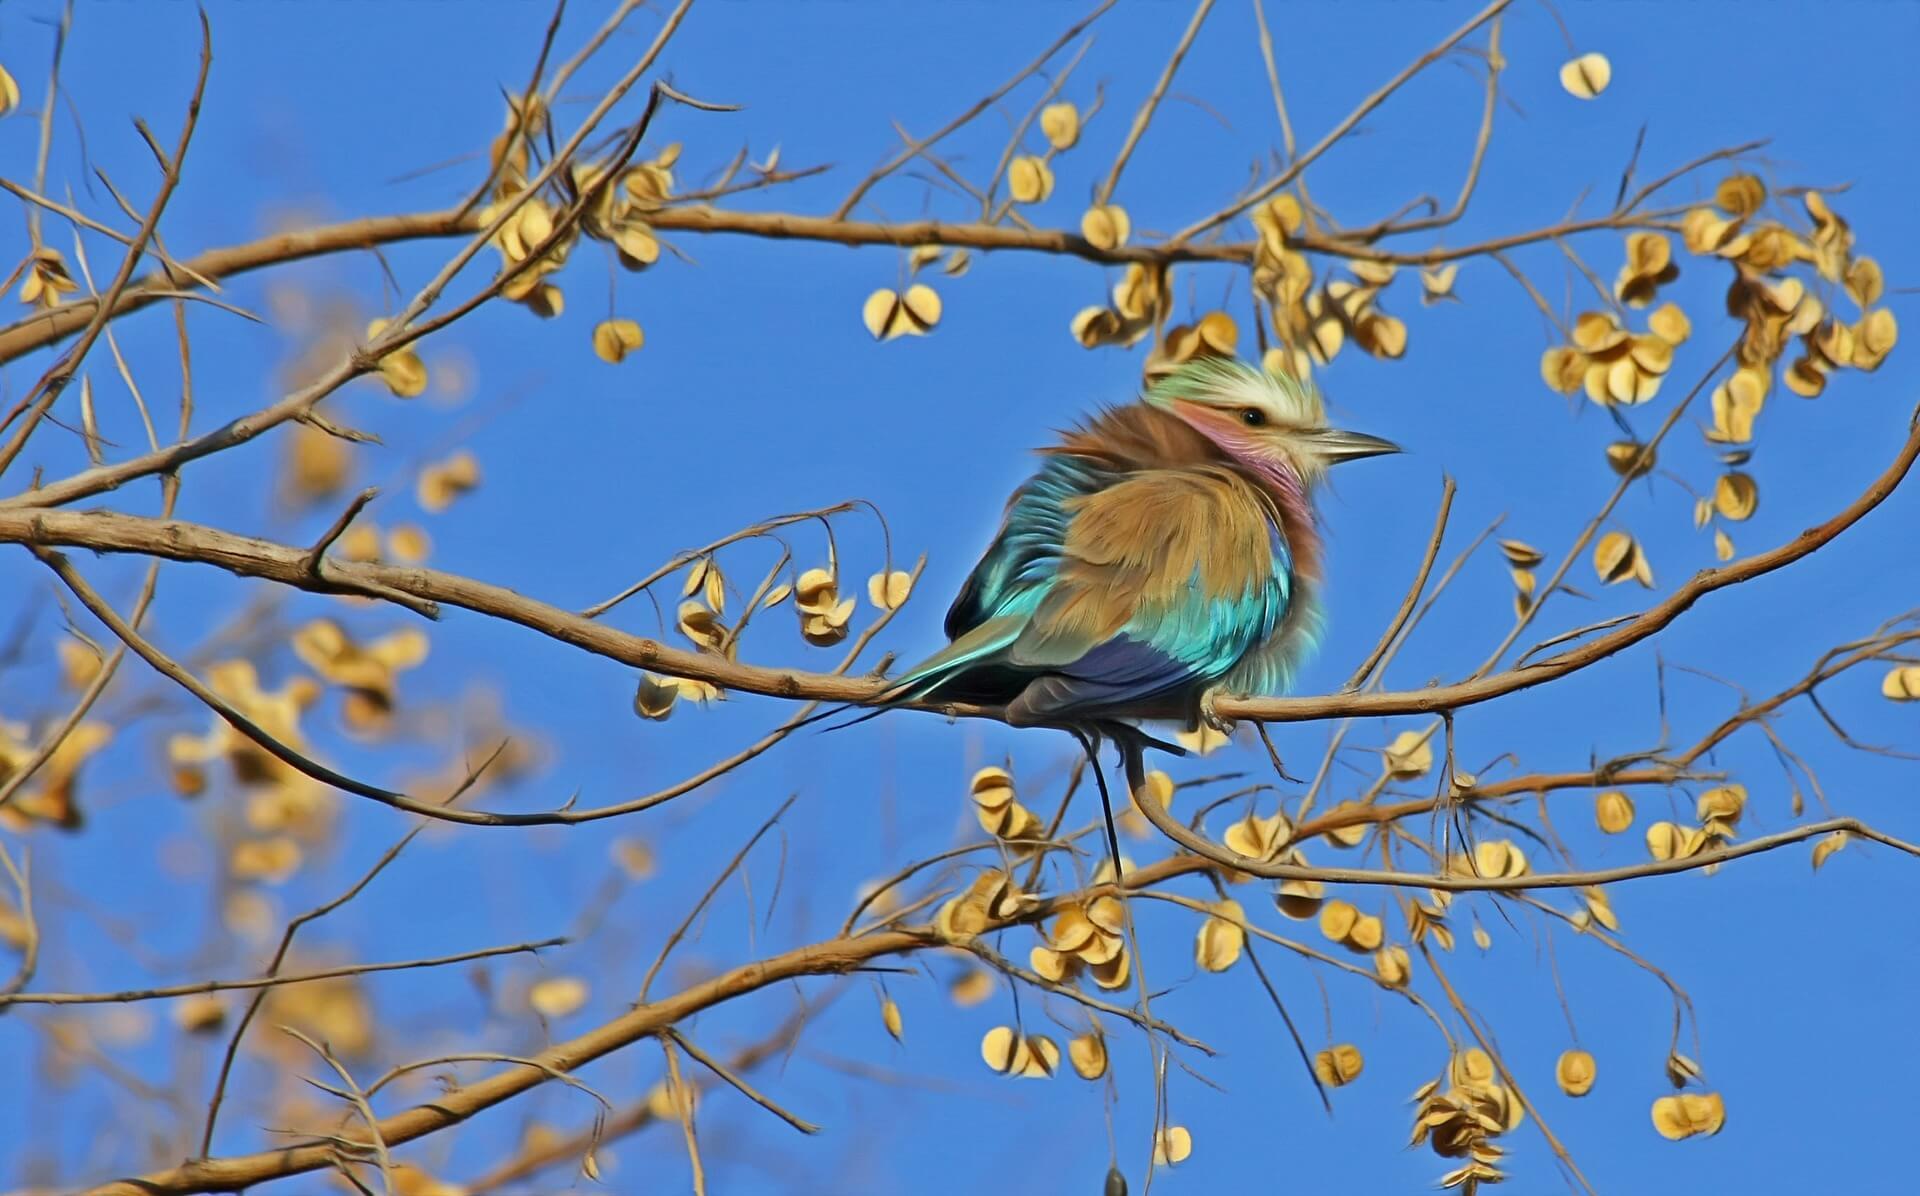 bird-515031_1920.jpg